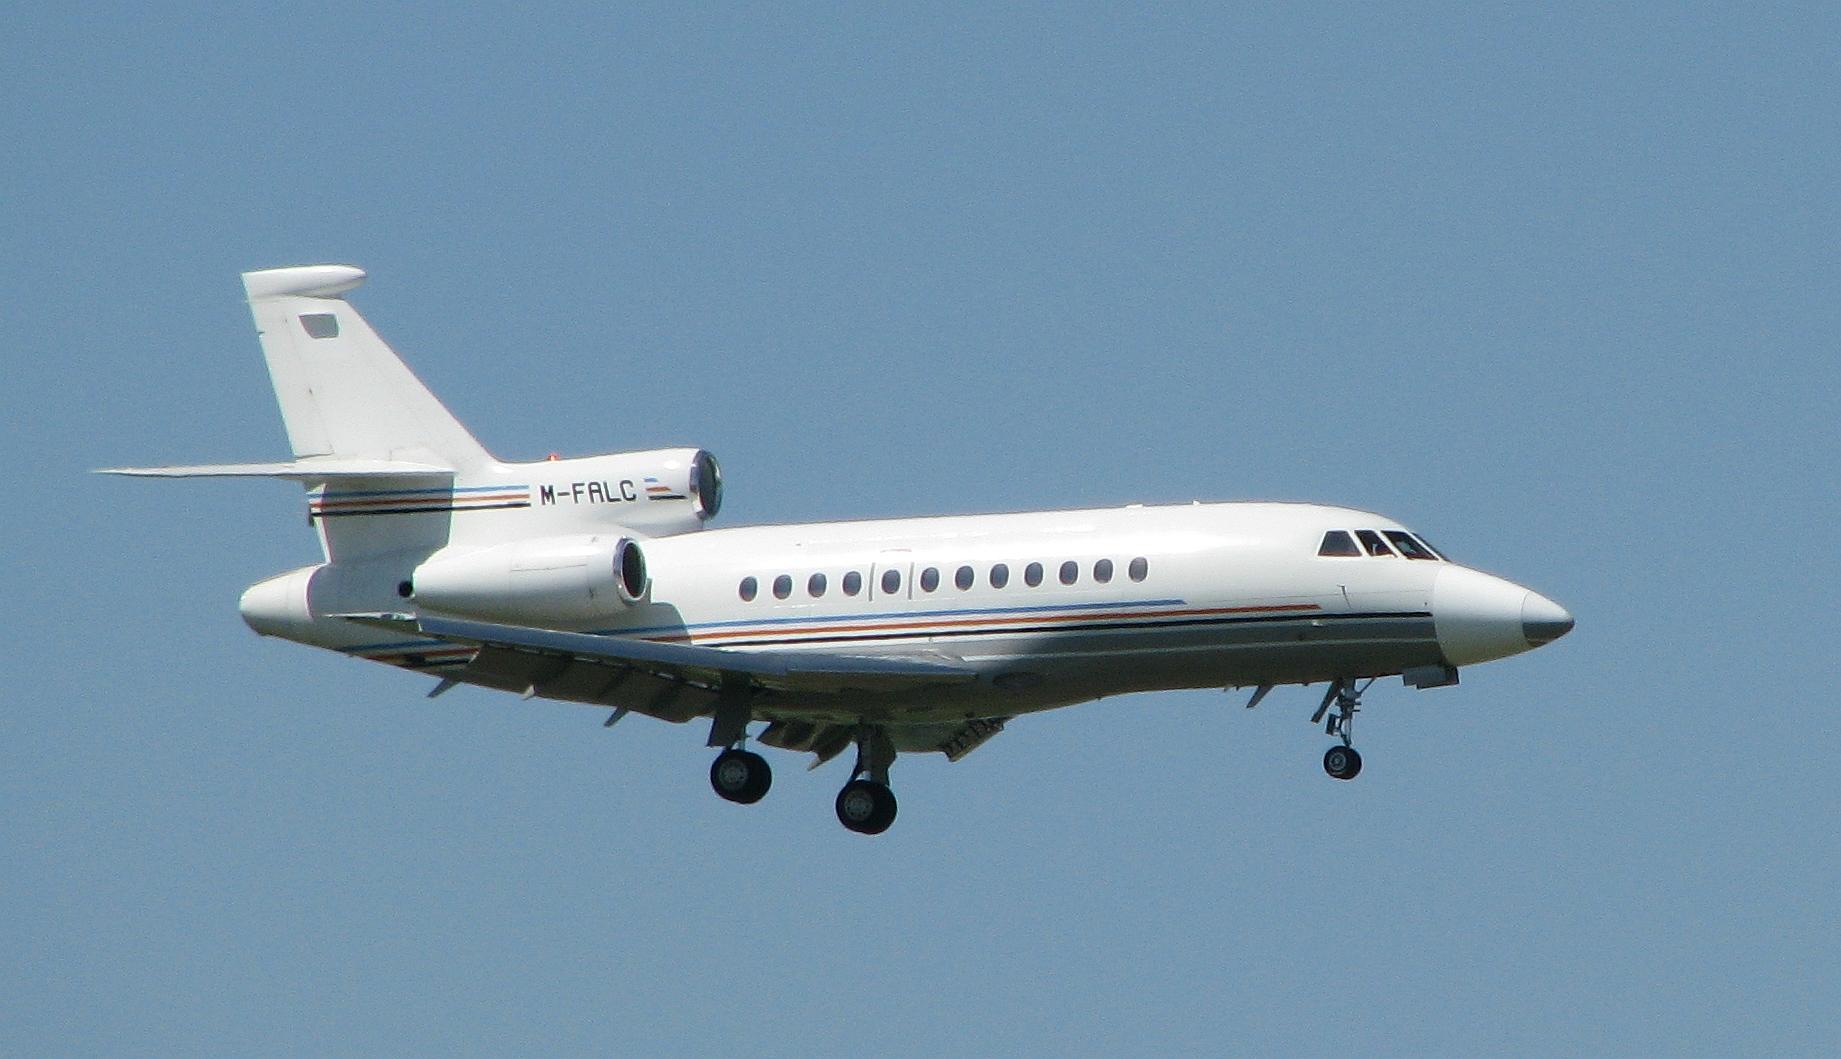 080513 Dassault Falcon 900EX M-FALC (at MUC).jpg